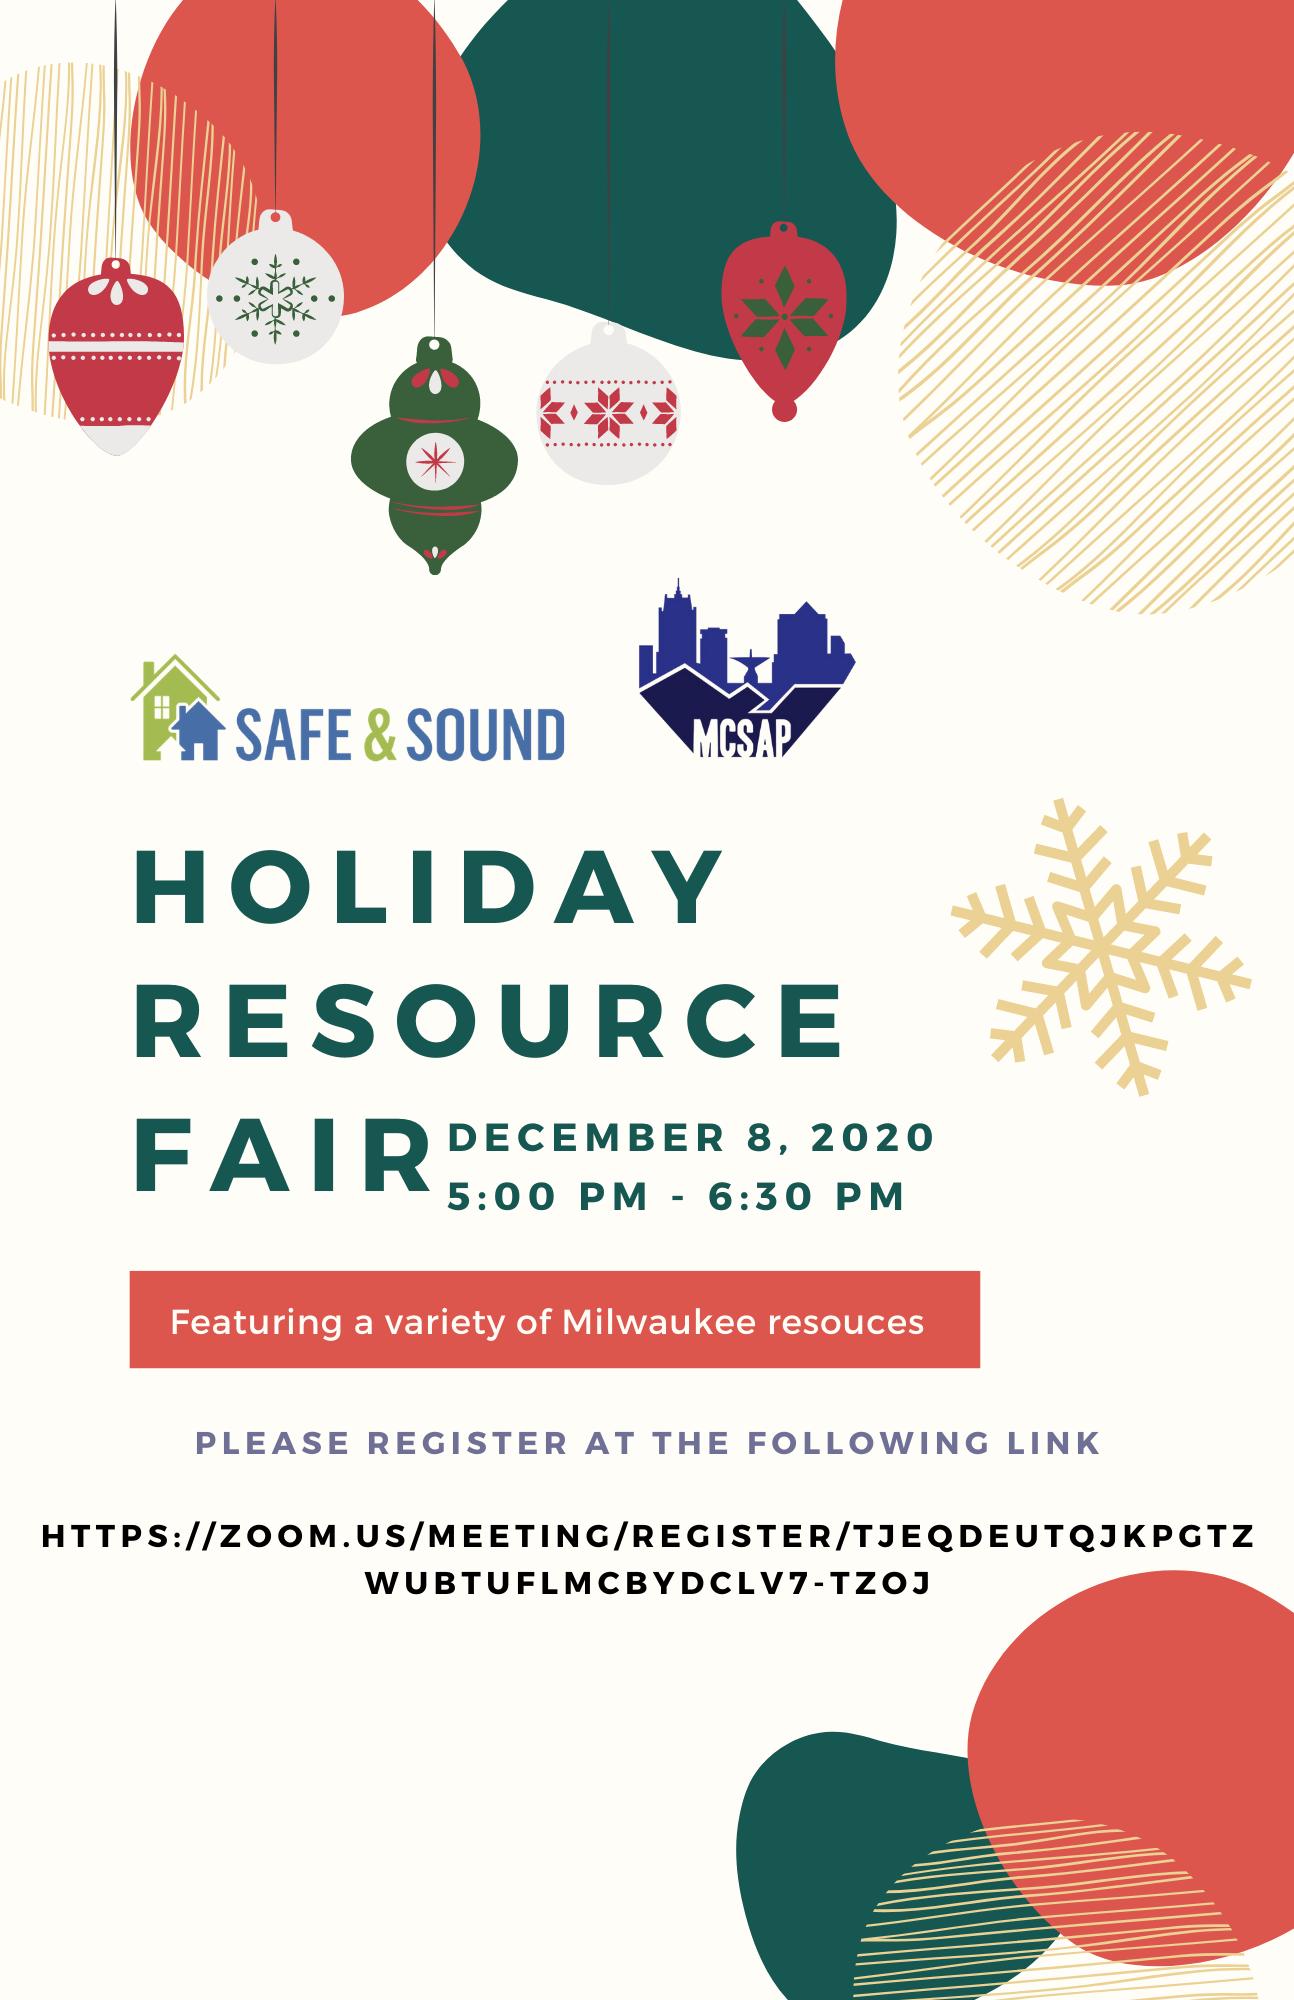 MCSAP & Safe & Sound's Holiday Resource Fair